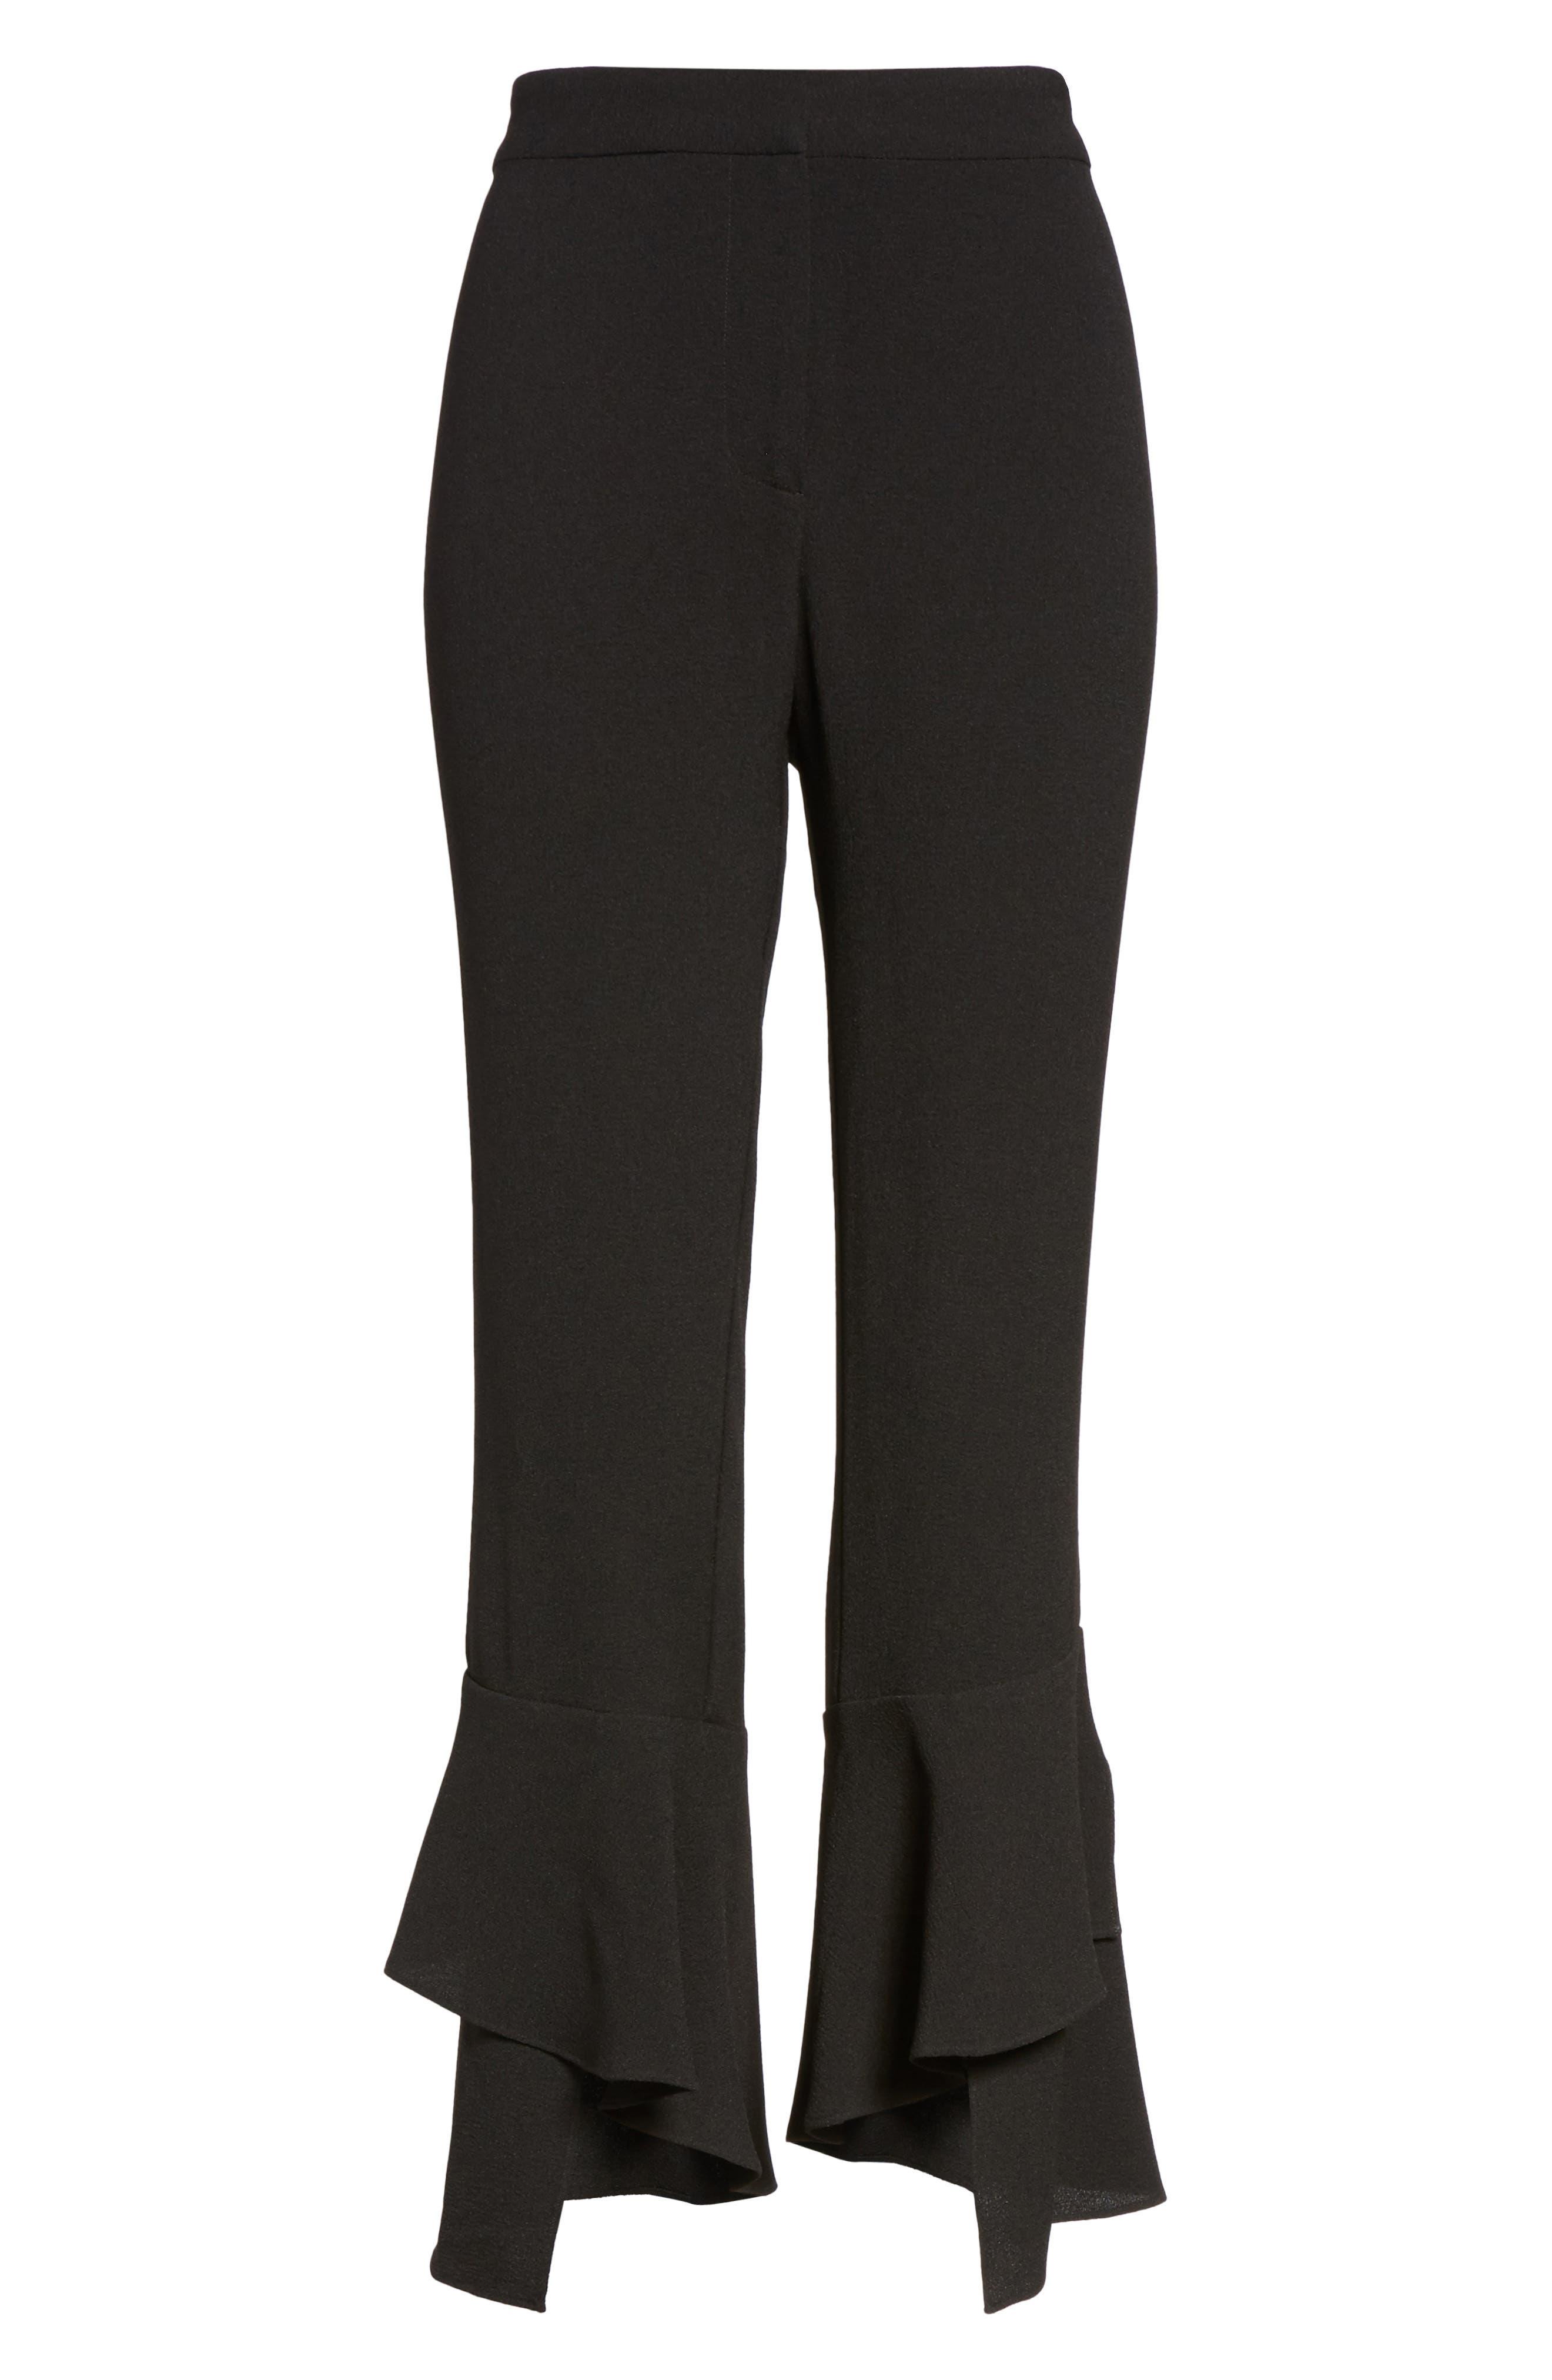 Gail Ruffle Hem Crop Pants,                             Alternate thumbnail 6, color,                             Black